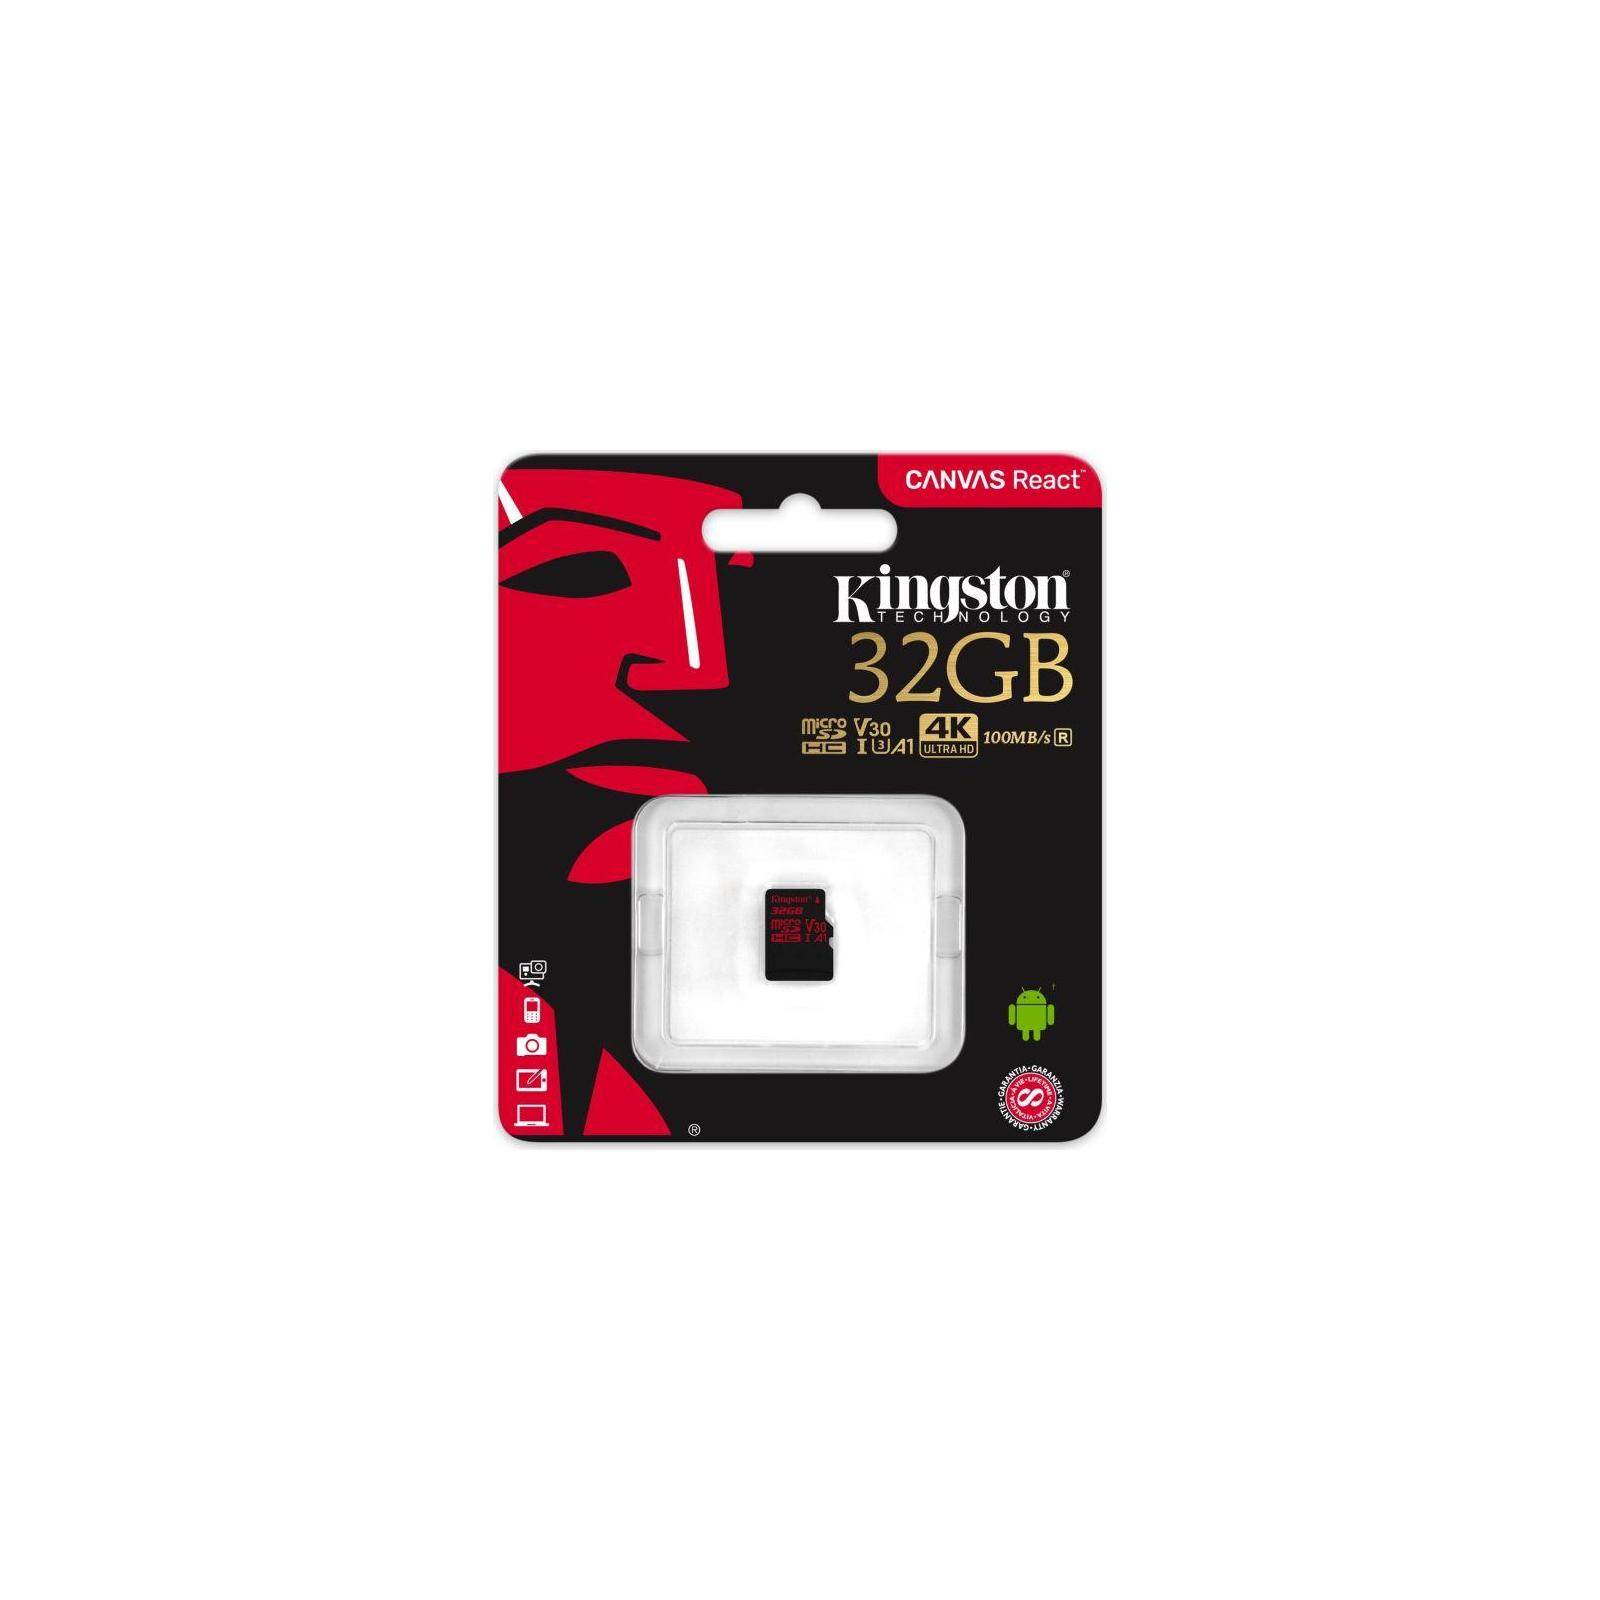 Карта памяти Kingston 32GB microSDHC class 10 UHS-I U3 (SDCR/32GBSP) изображение 3